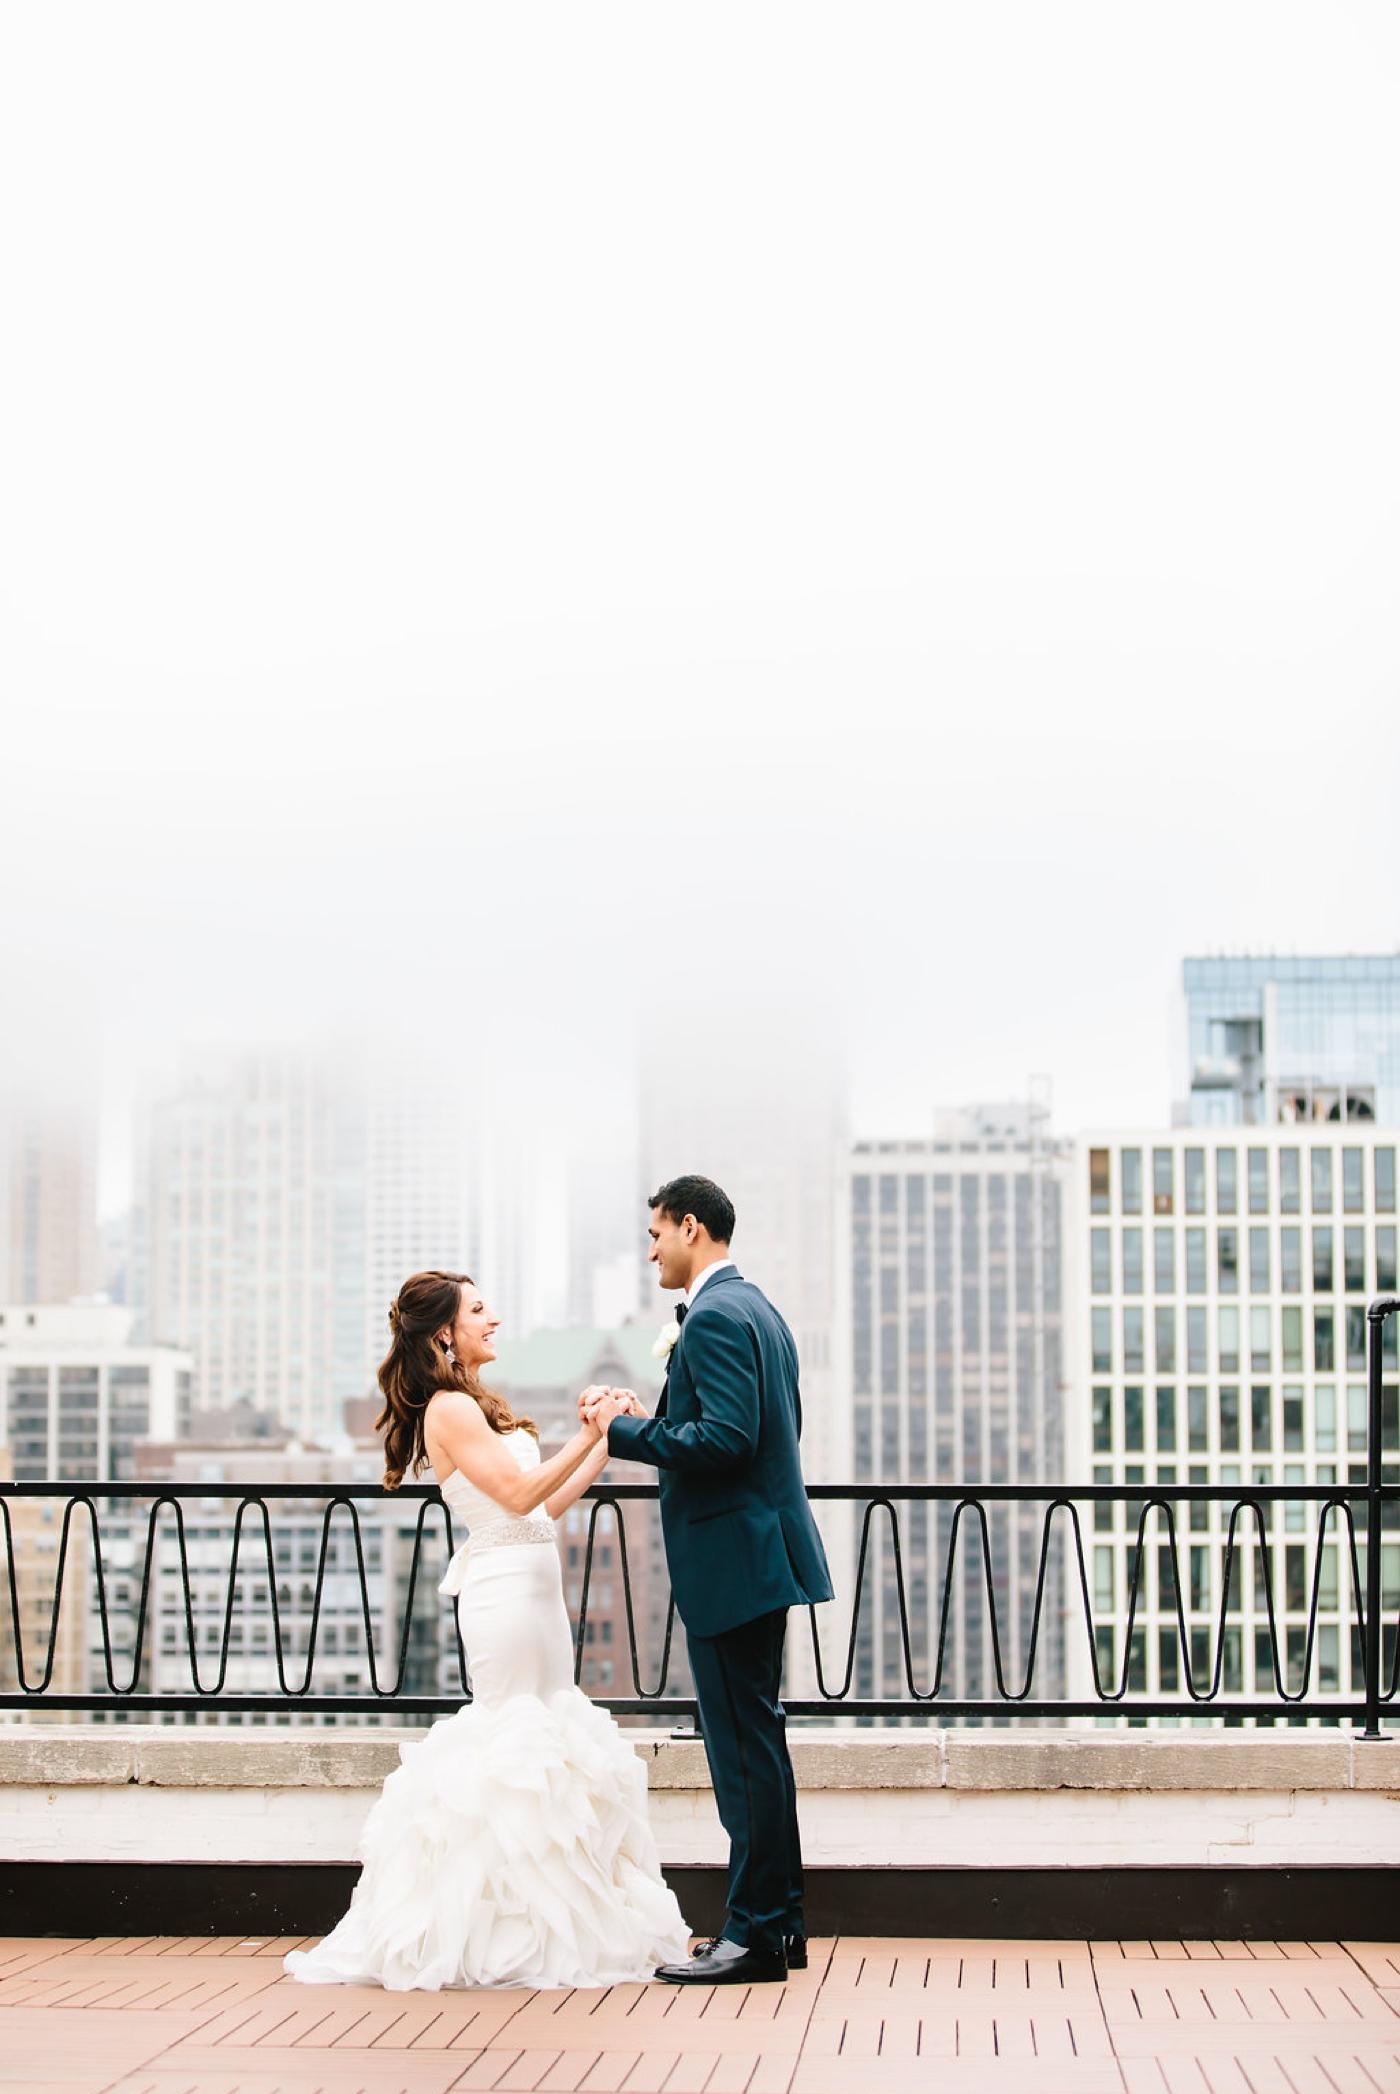 chicago-fine-art-wedding-photography-sakamuri20